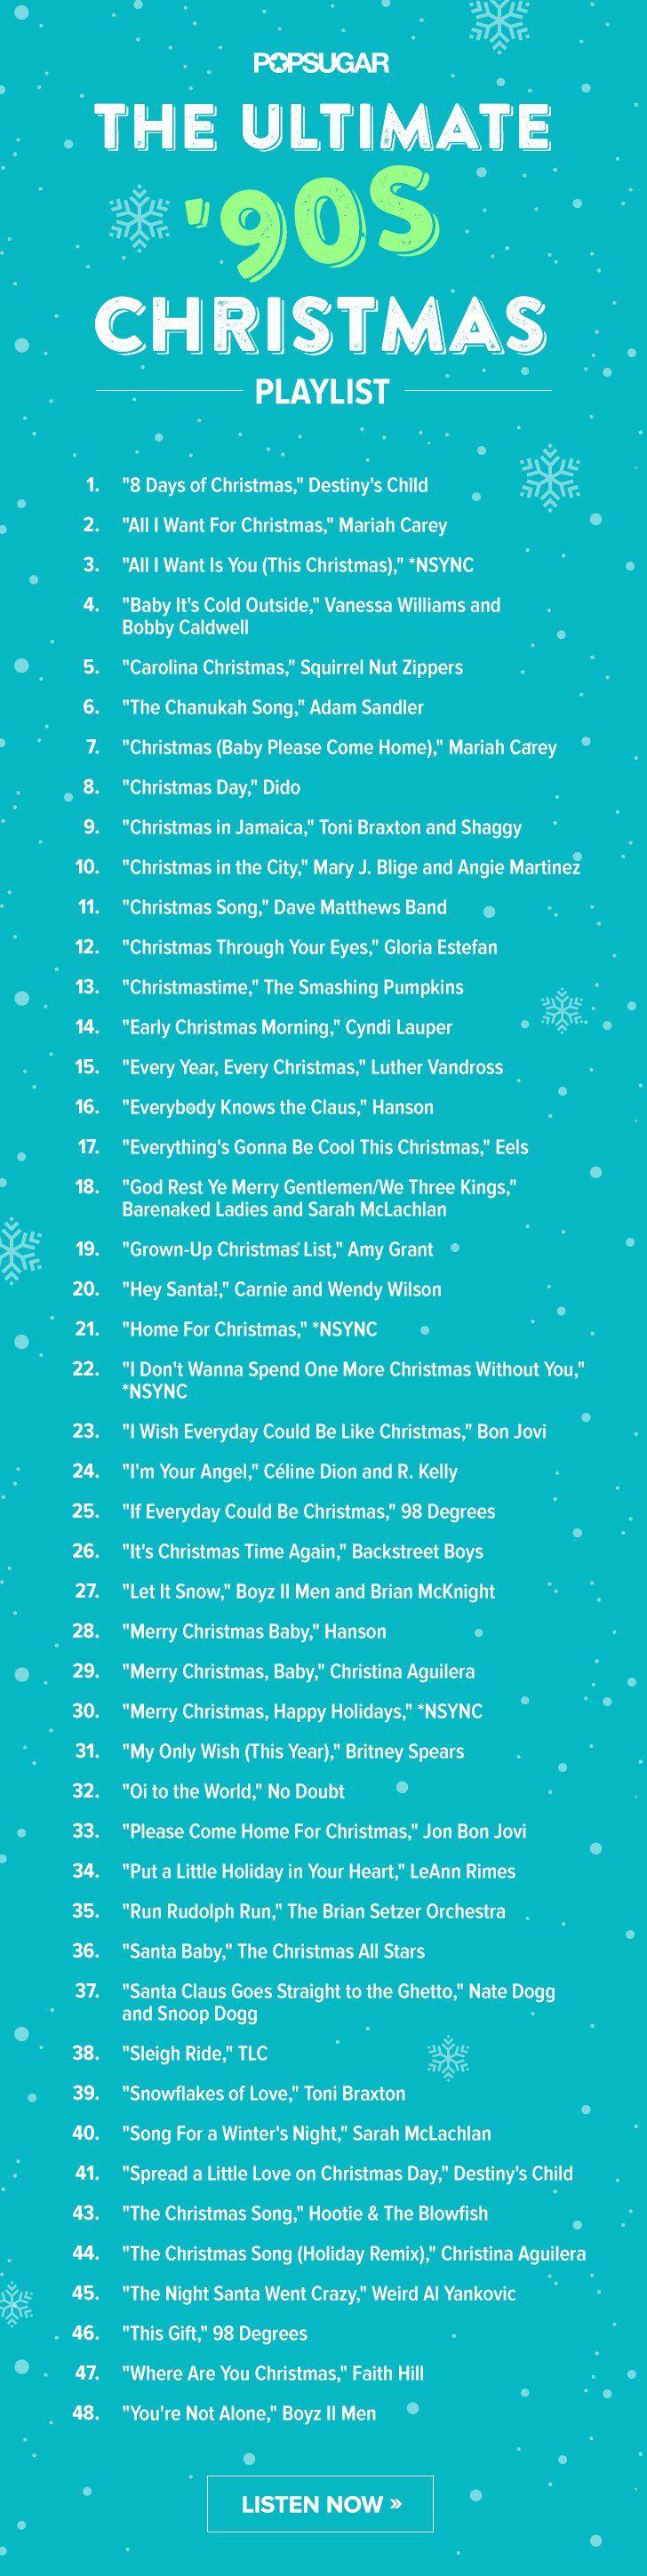 best 25 musik ideas on pinterest cheer up lyrics song list and